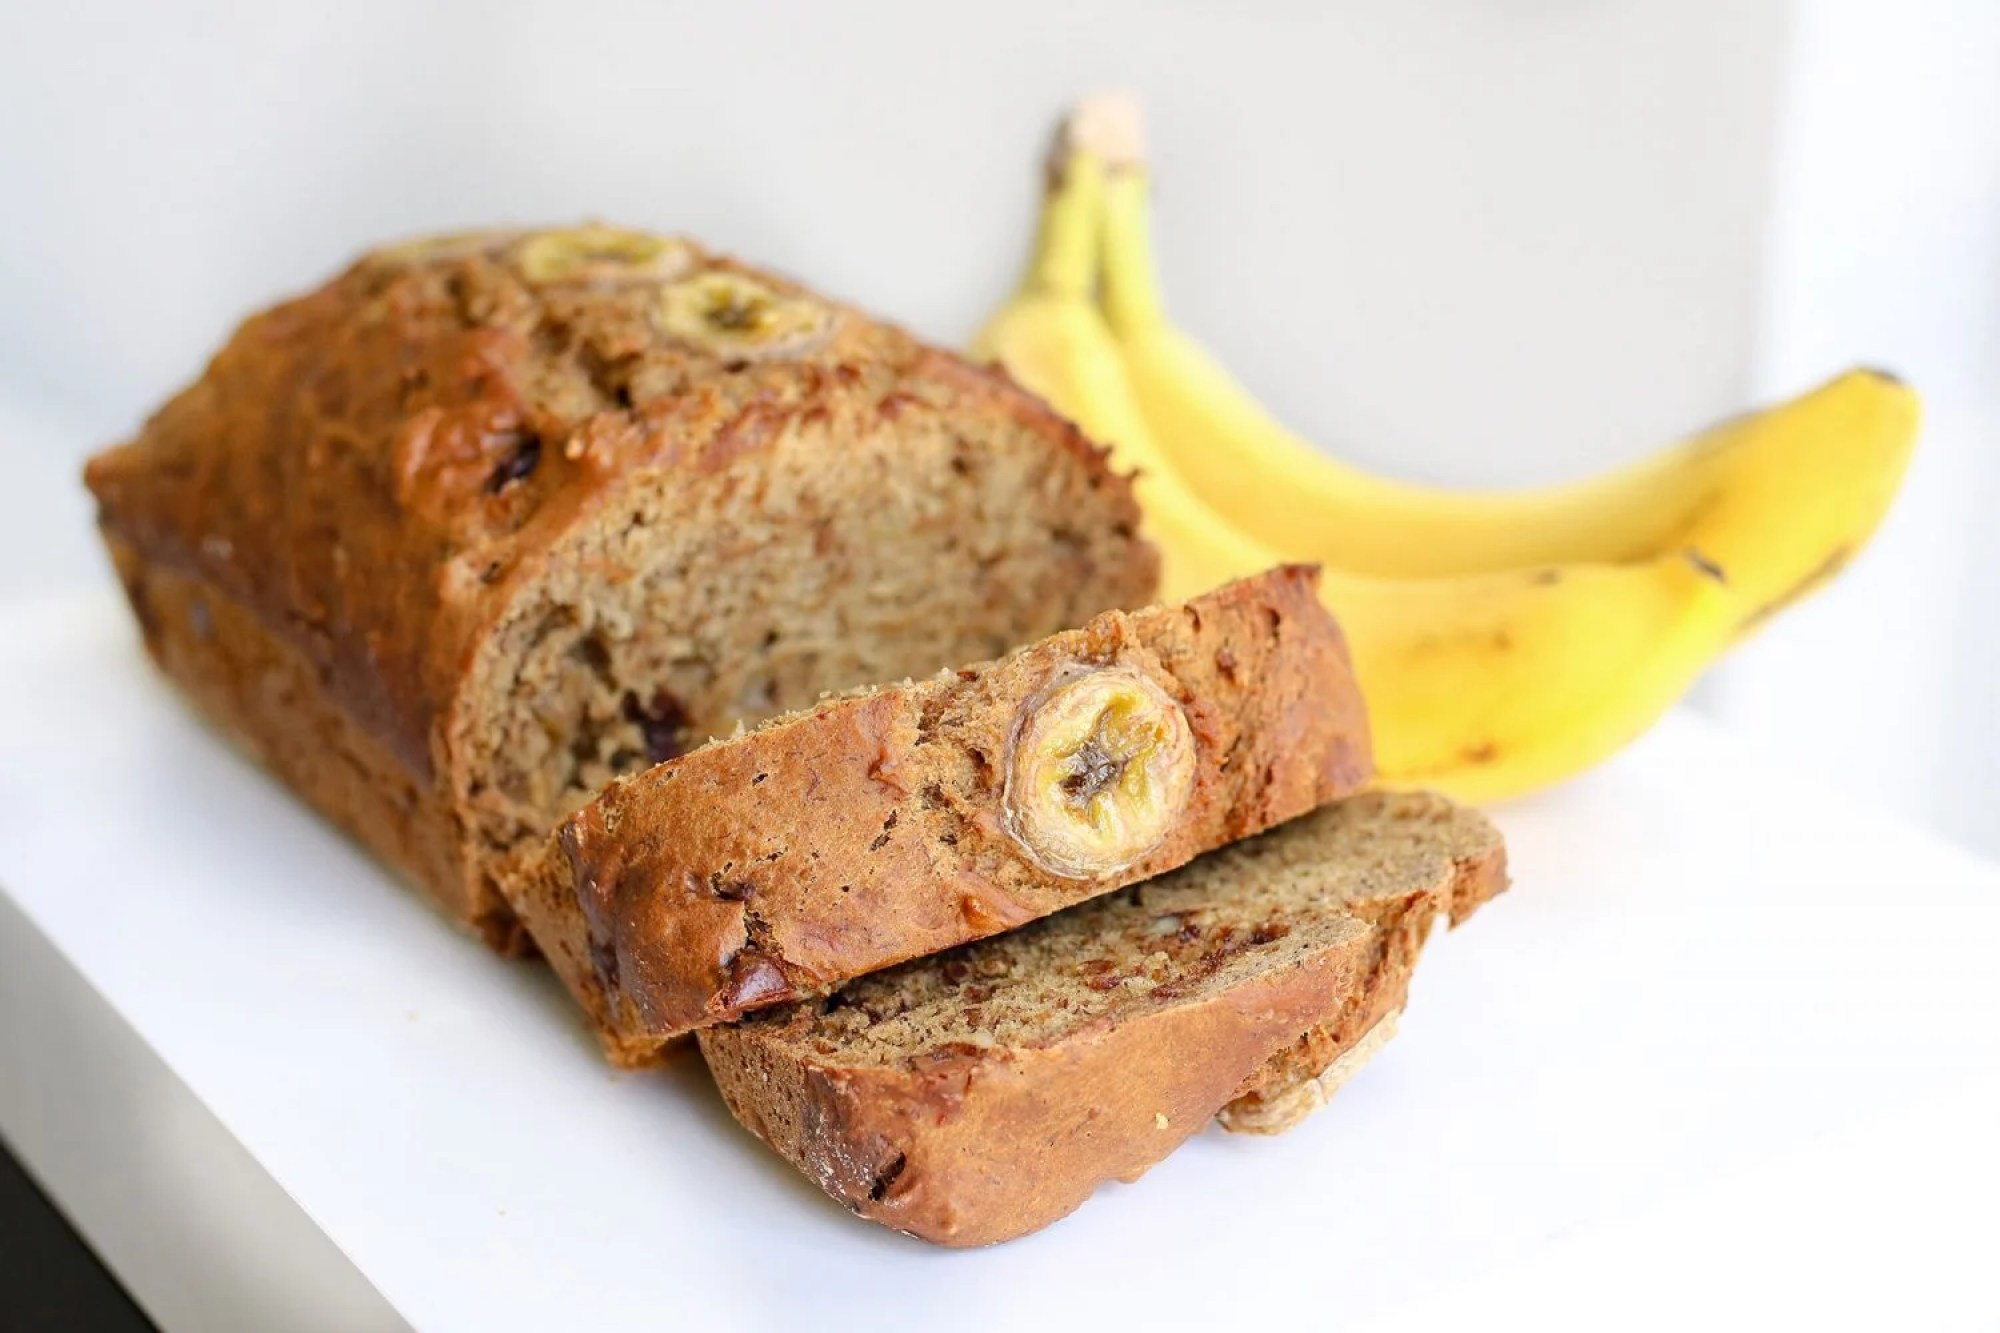 vegan banana bread, vegan banana nut bread, vegan banana nut chocolate chip bread, healthy kid foods, kid friendly snacks, kid friendly breakfast, easy breakfast ideas, easy snack ideas, mom blog, mom blogger, mom bloggers, mom blogs, family friendly dishes, recipes, recipe, food blog, food bloggers